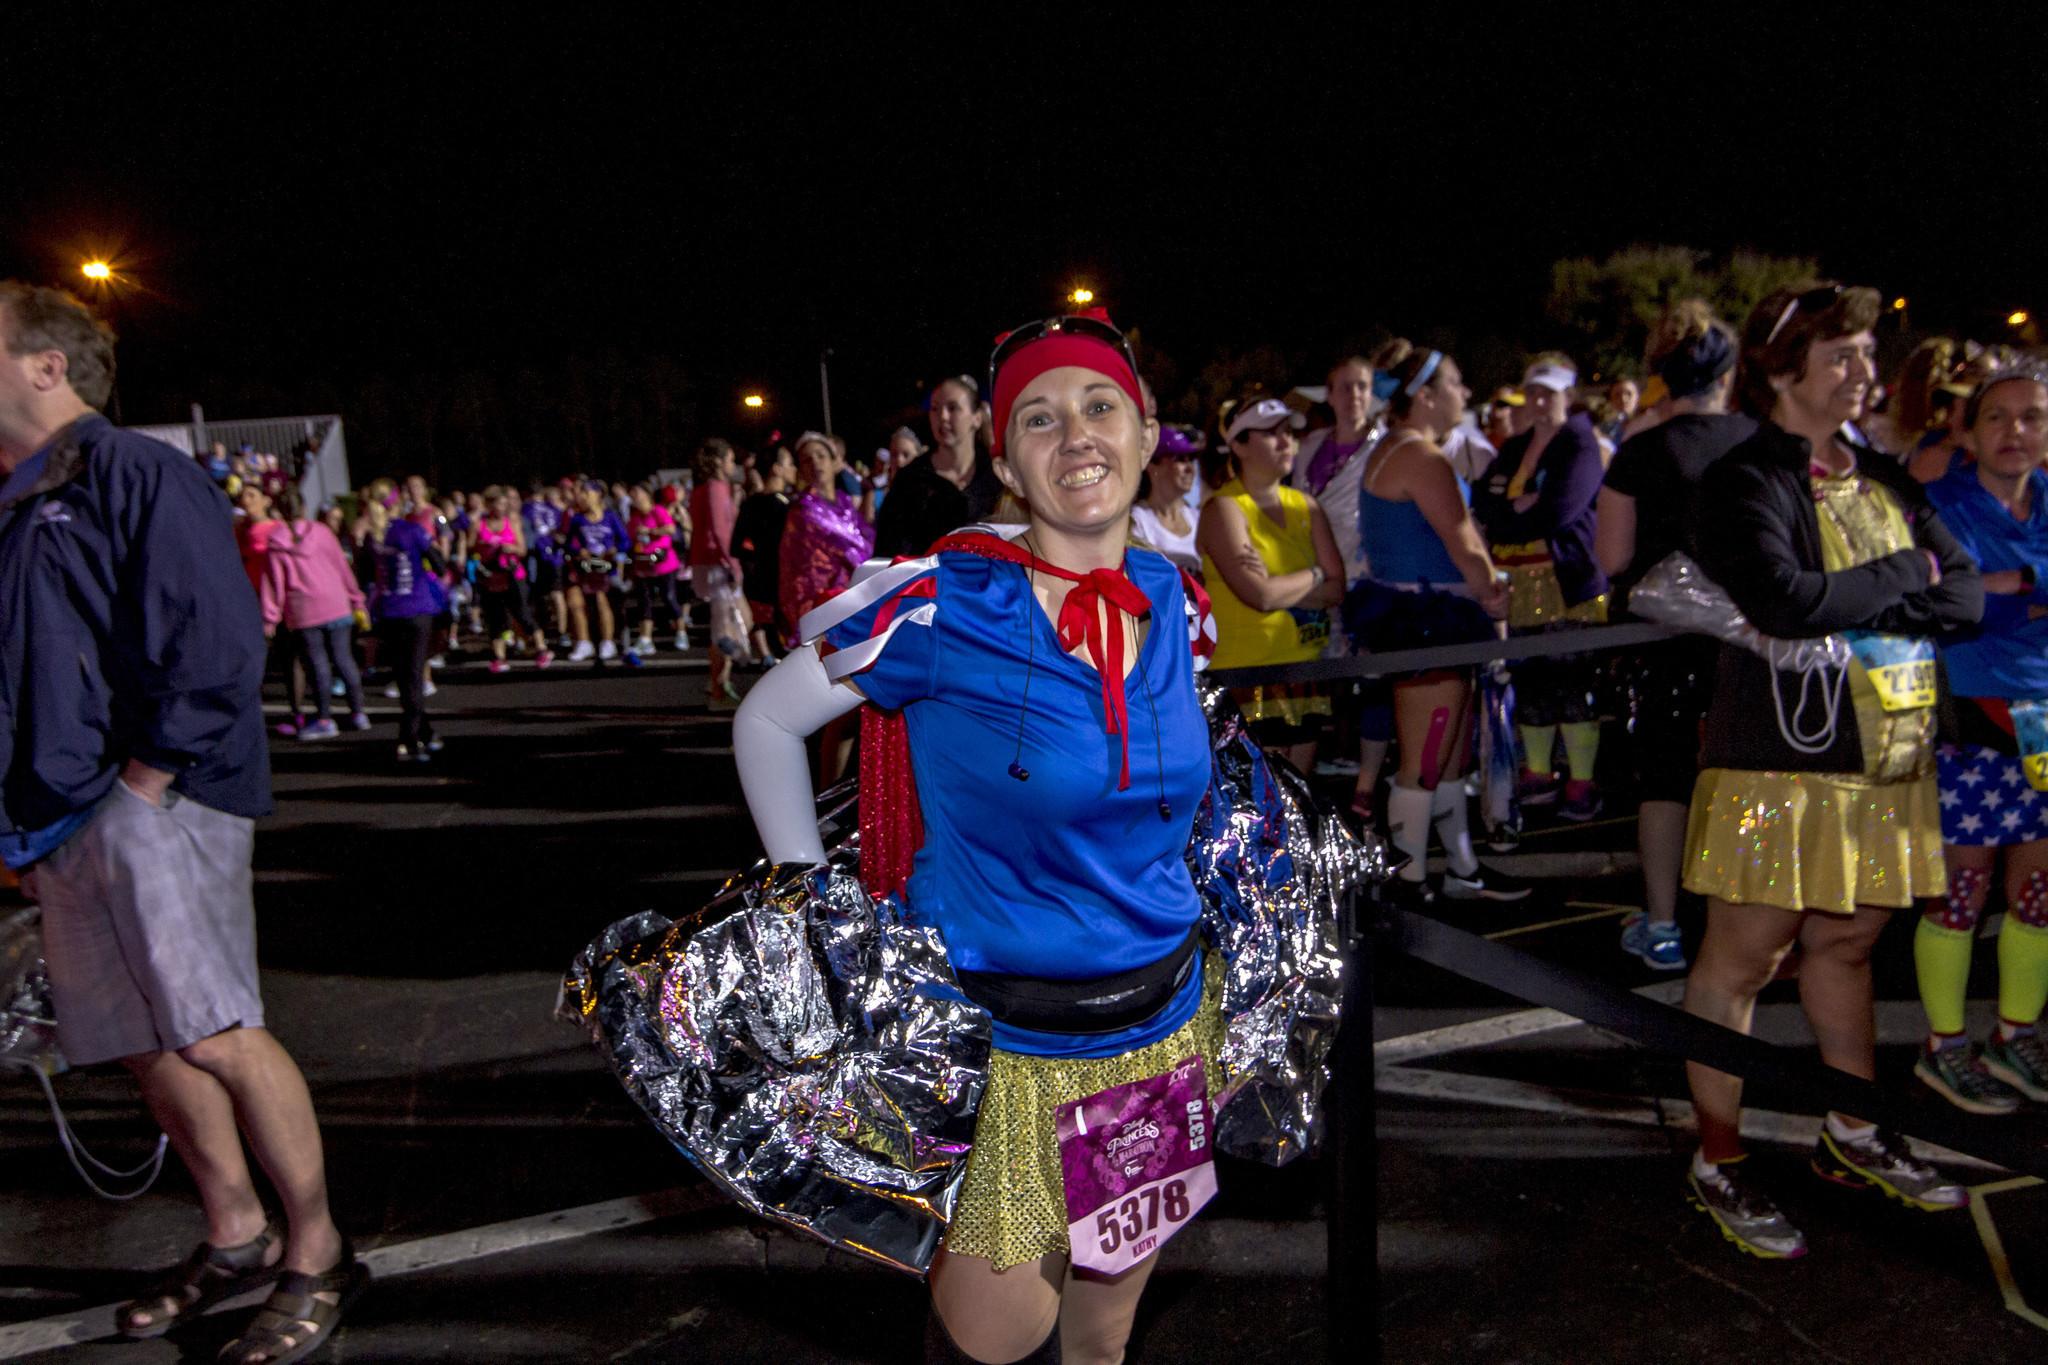 Pictures 2017 Disney Princess Half Marathon Orlando Sentinel Polygo Minie Mouse By